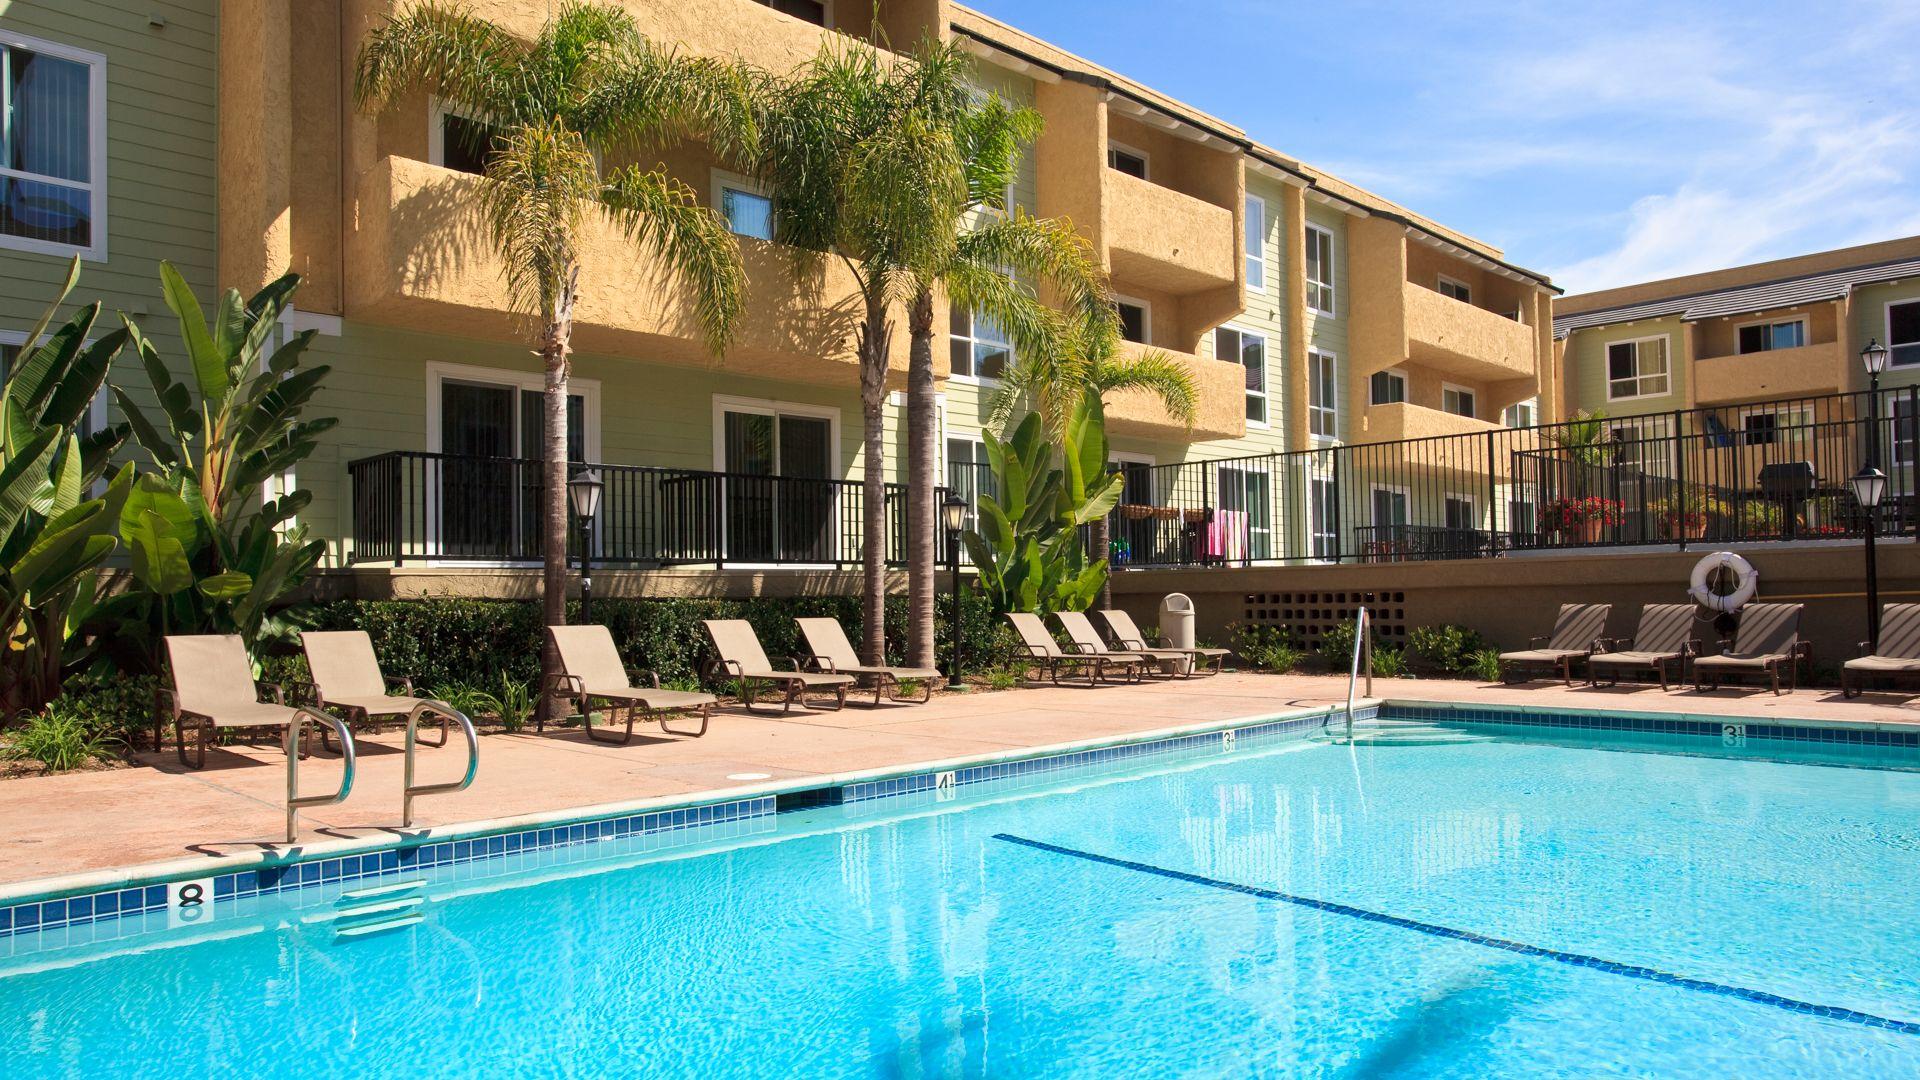 Playa Pacifica Apartments - Swimming Pool